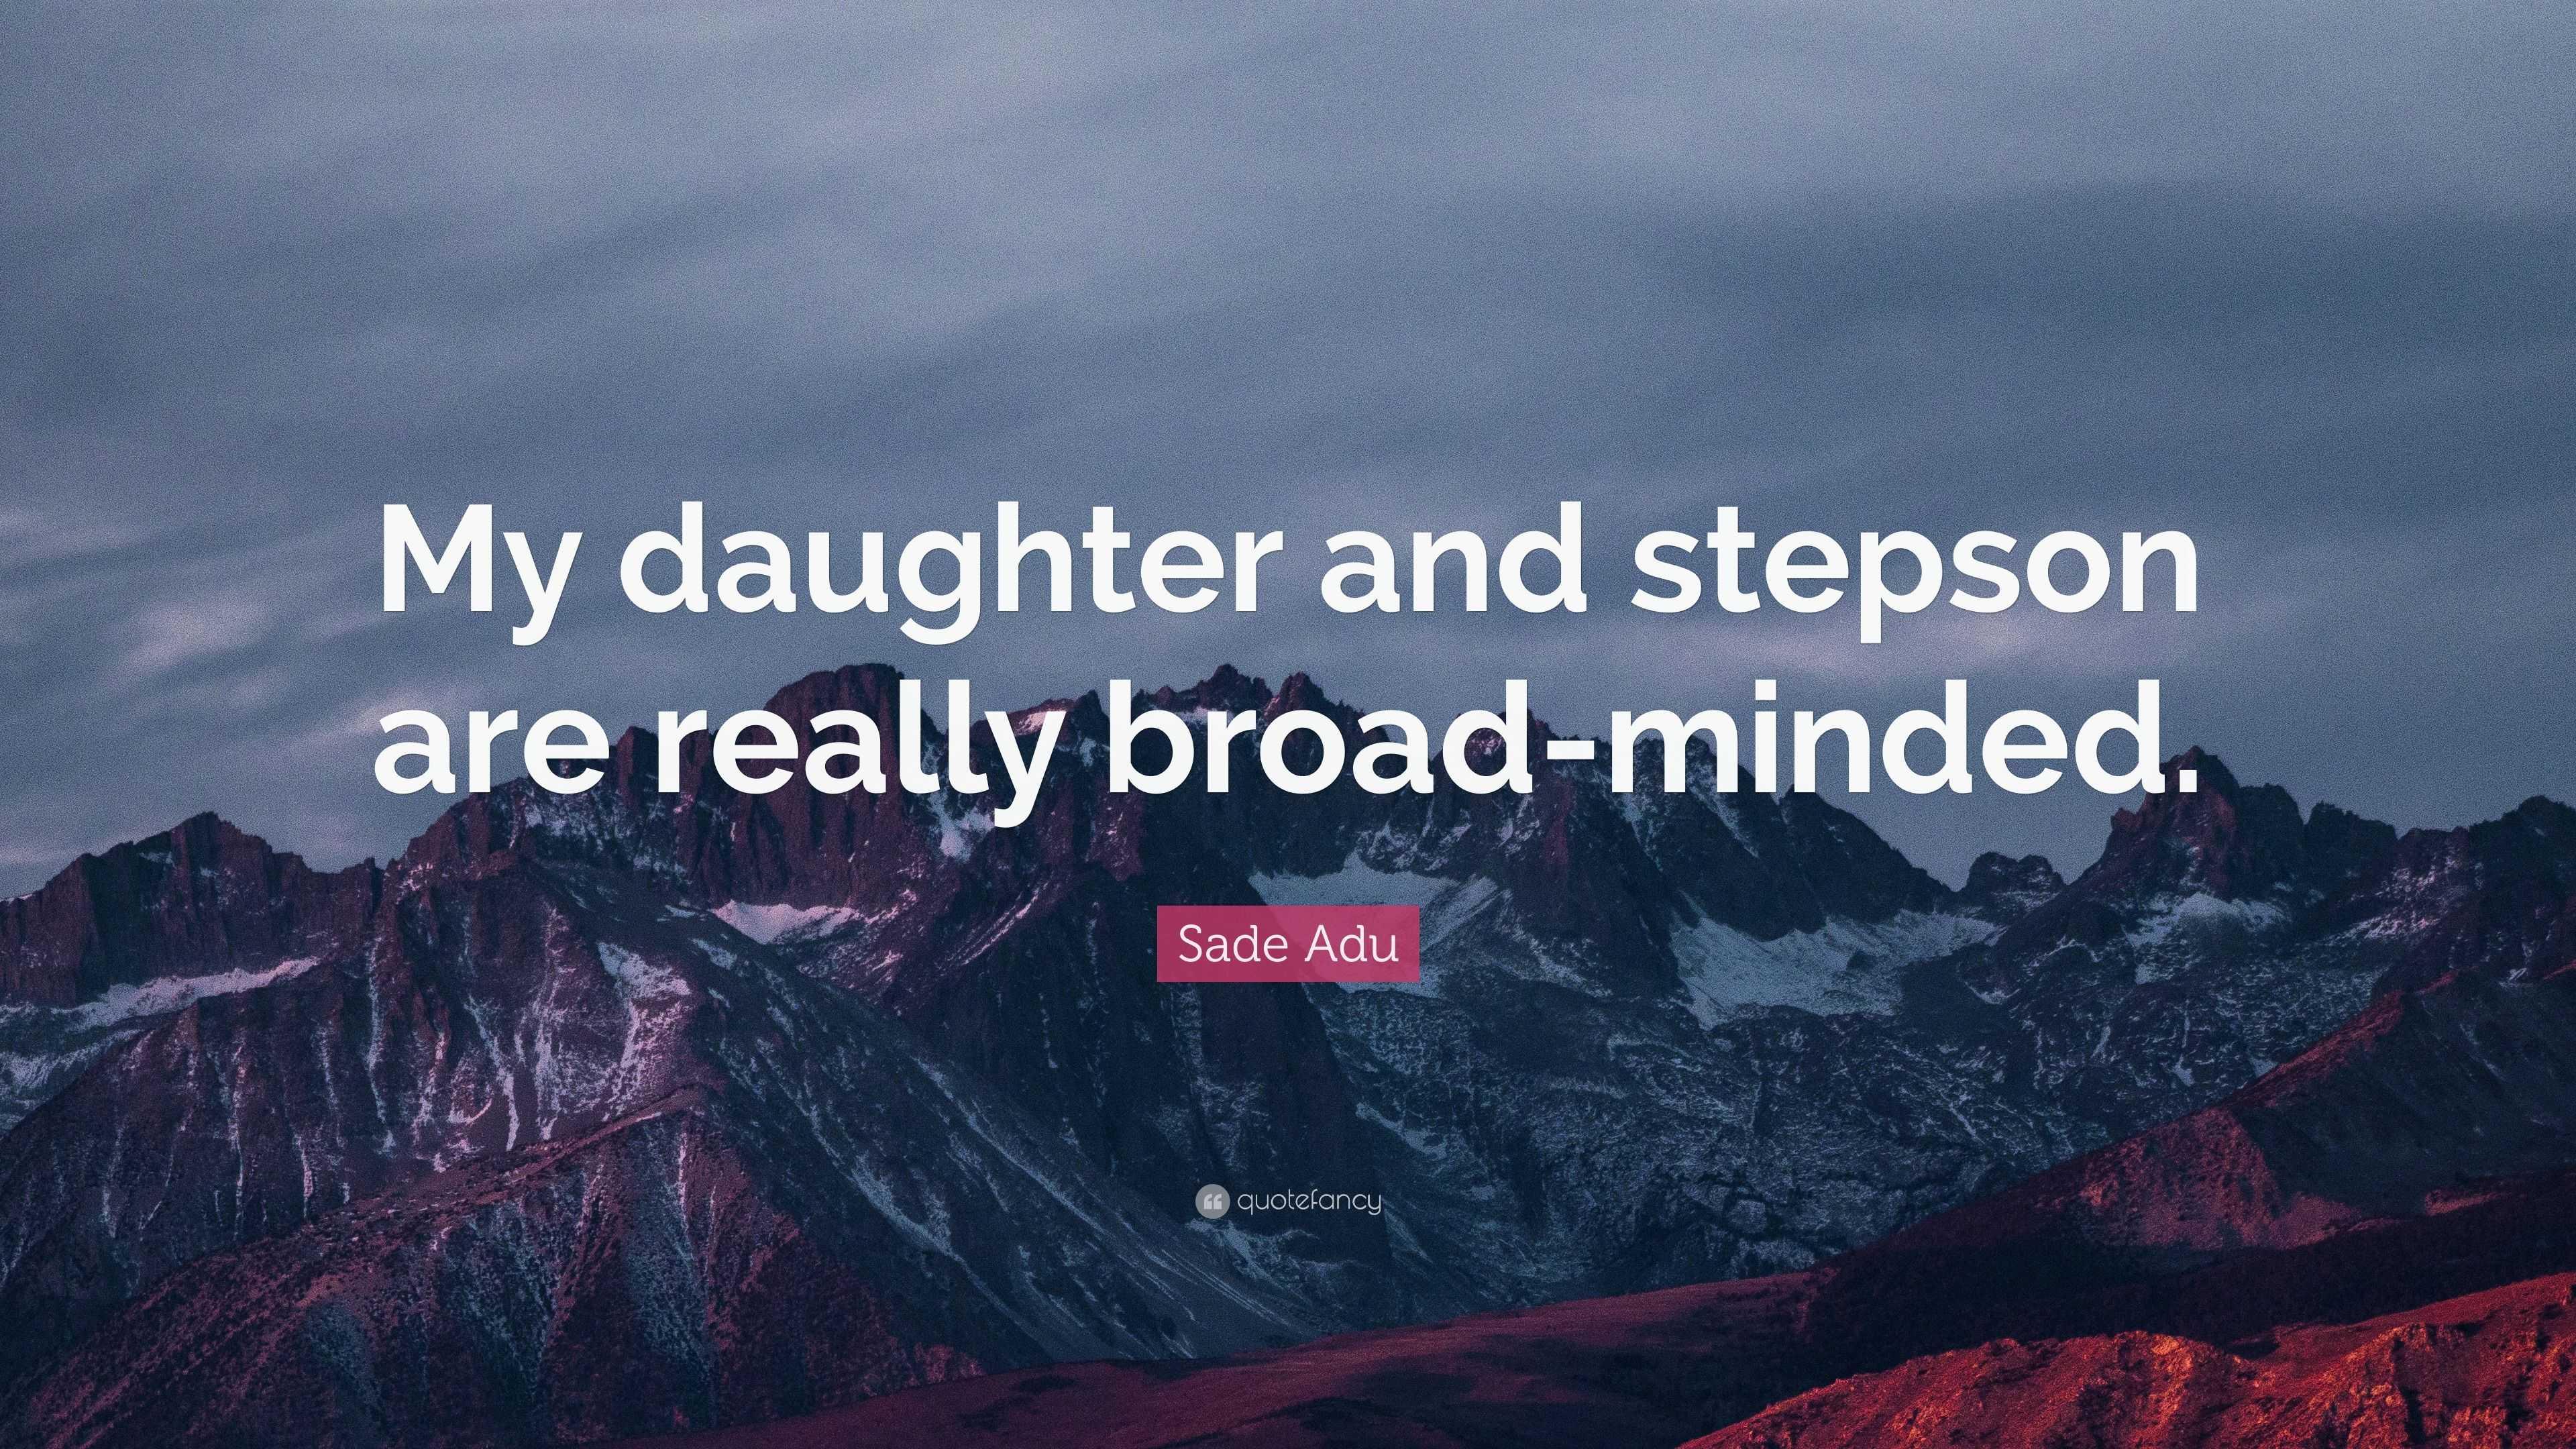 Sade Adu Quotes (36 wallpapers) - Quotefancy